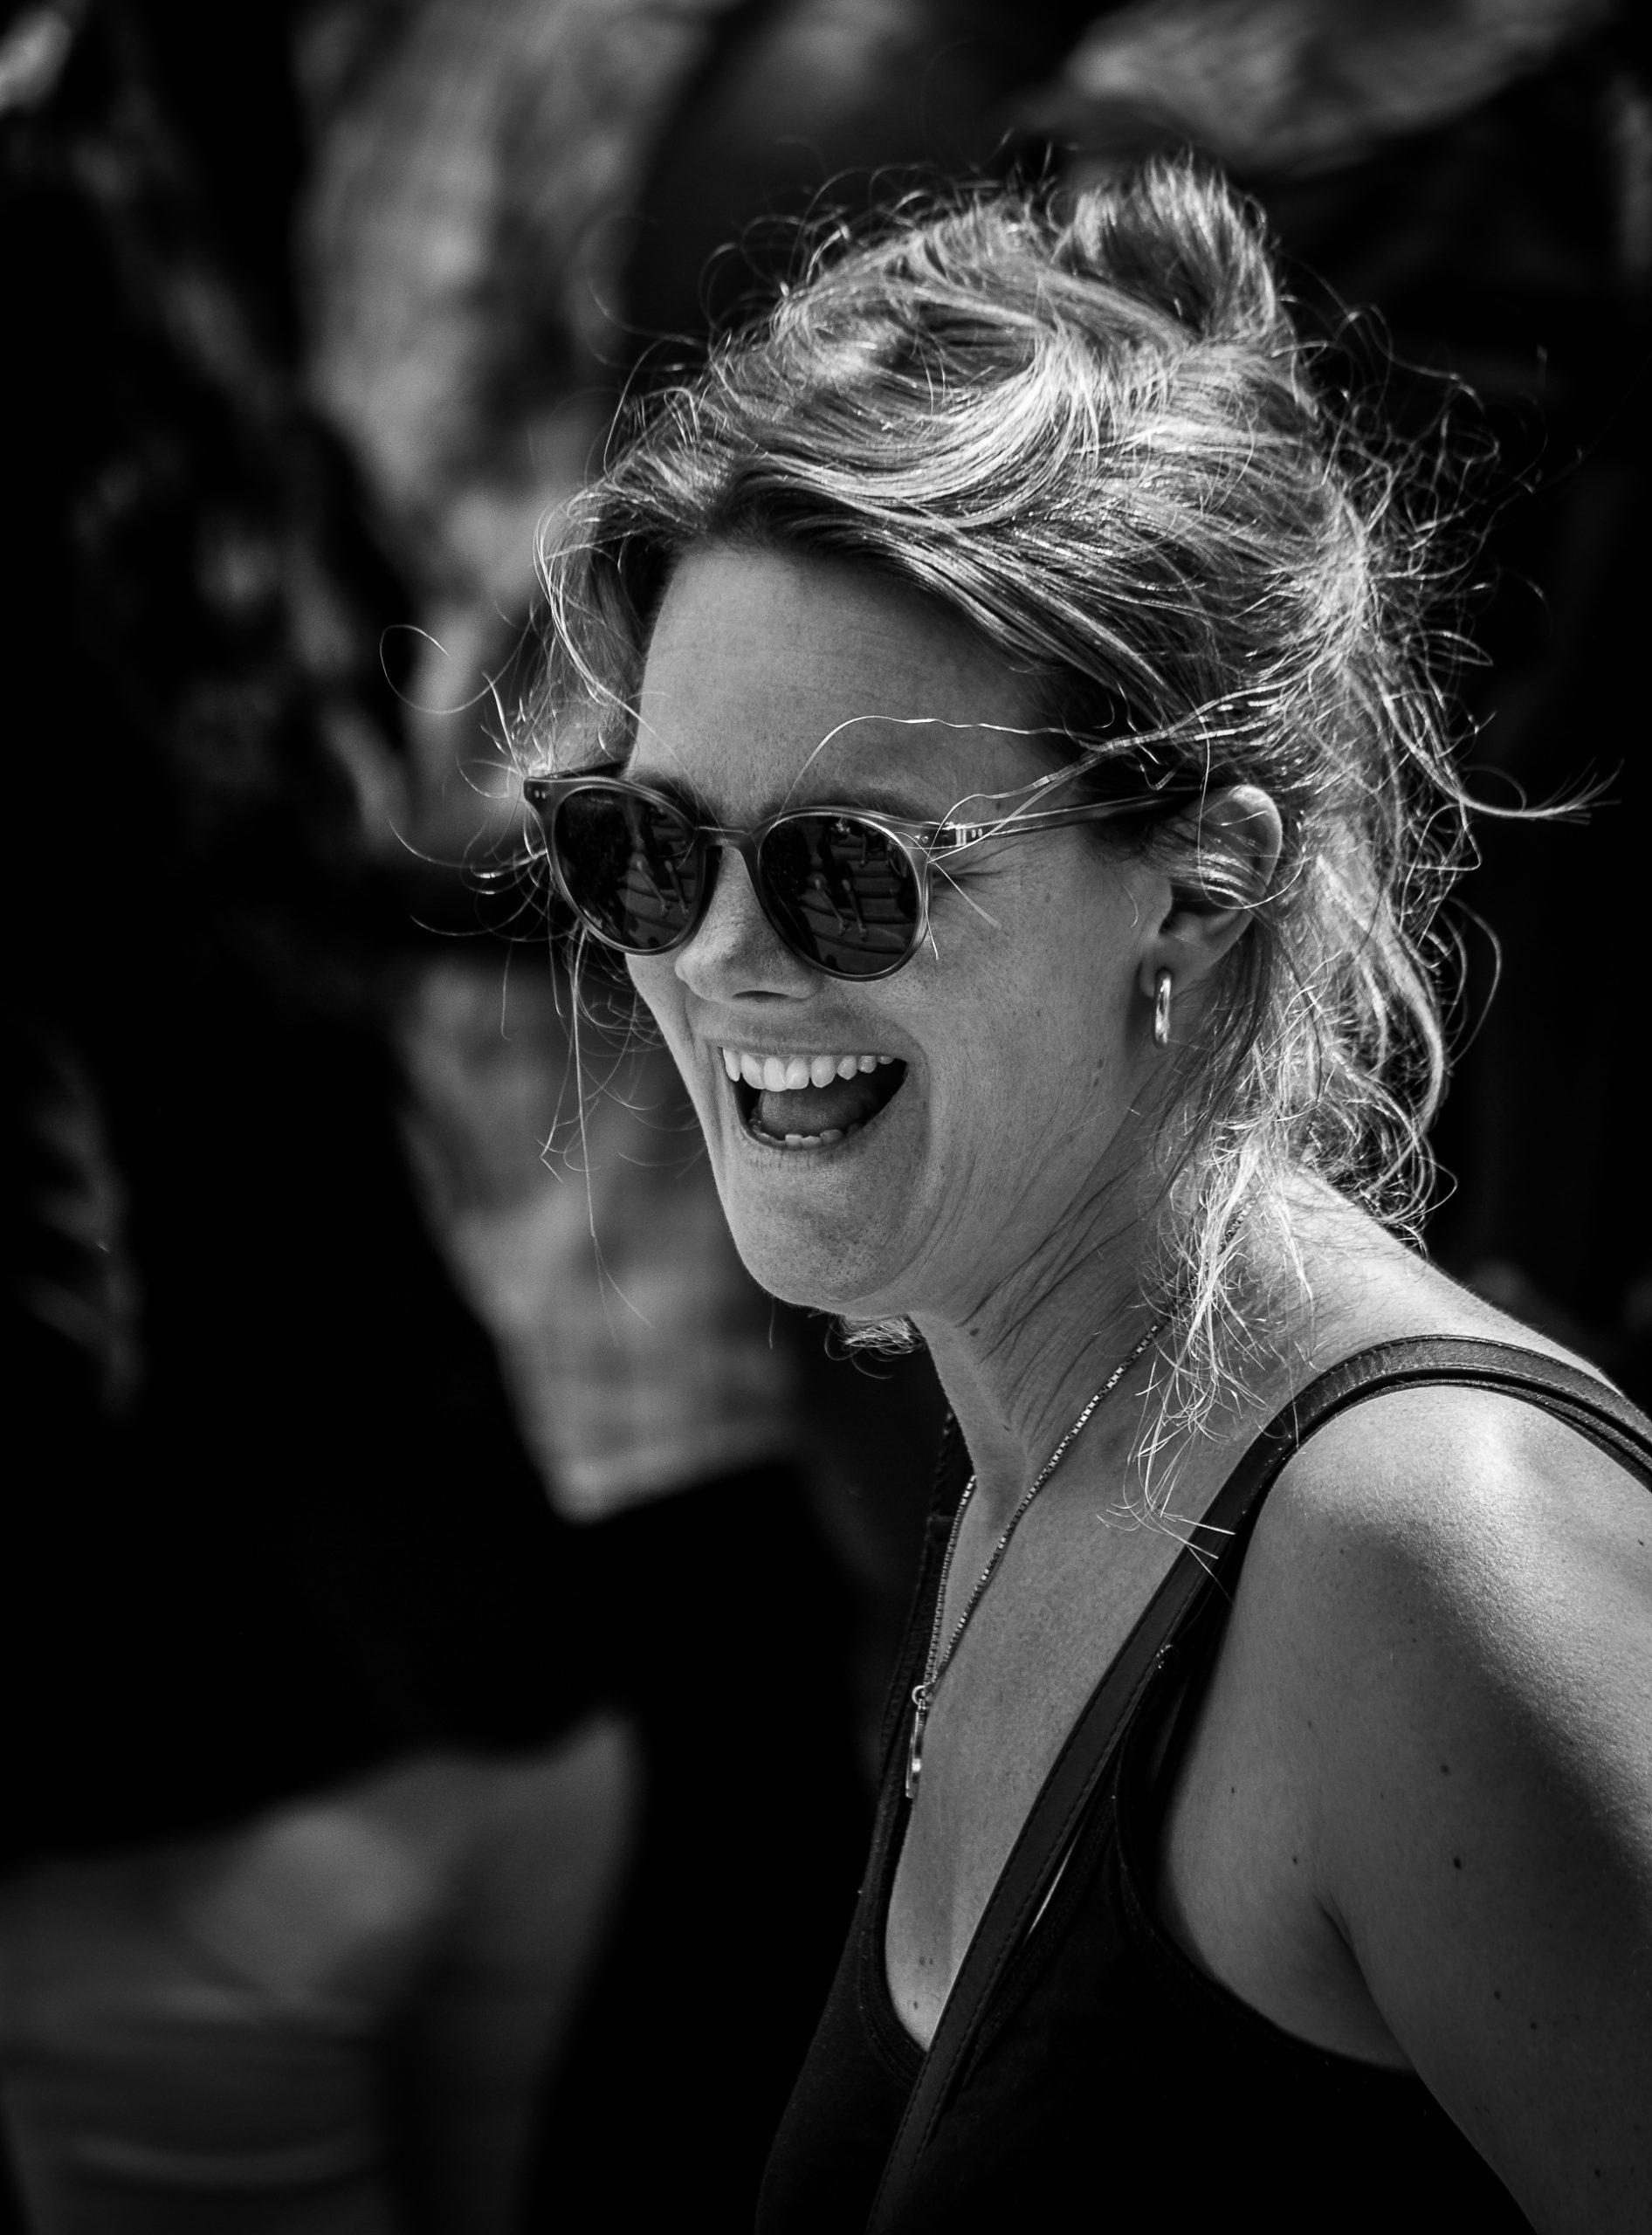 Portrait of a happy woman